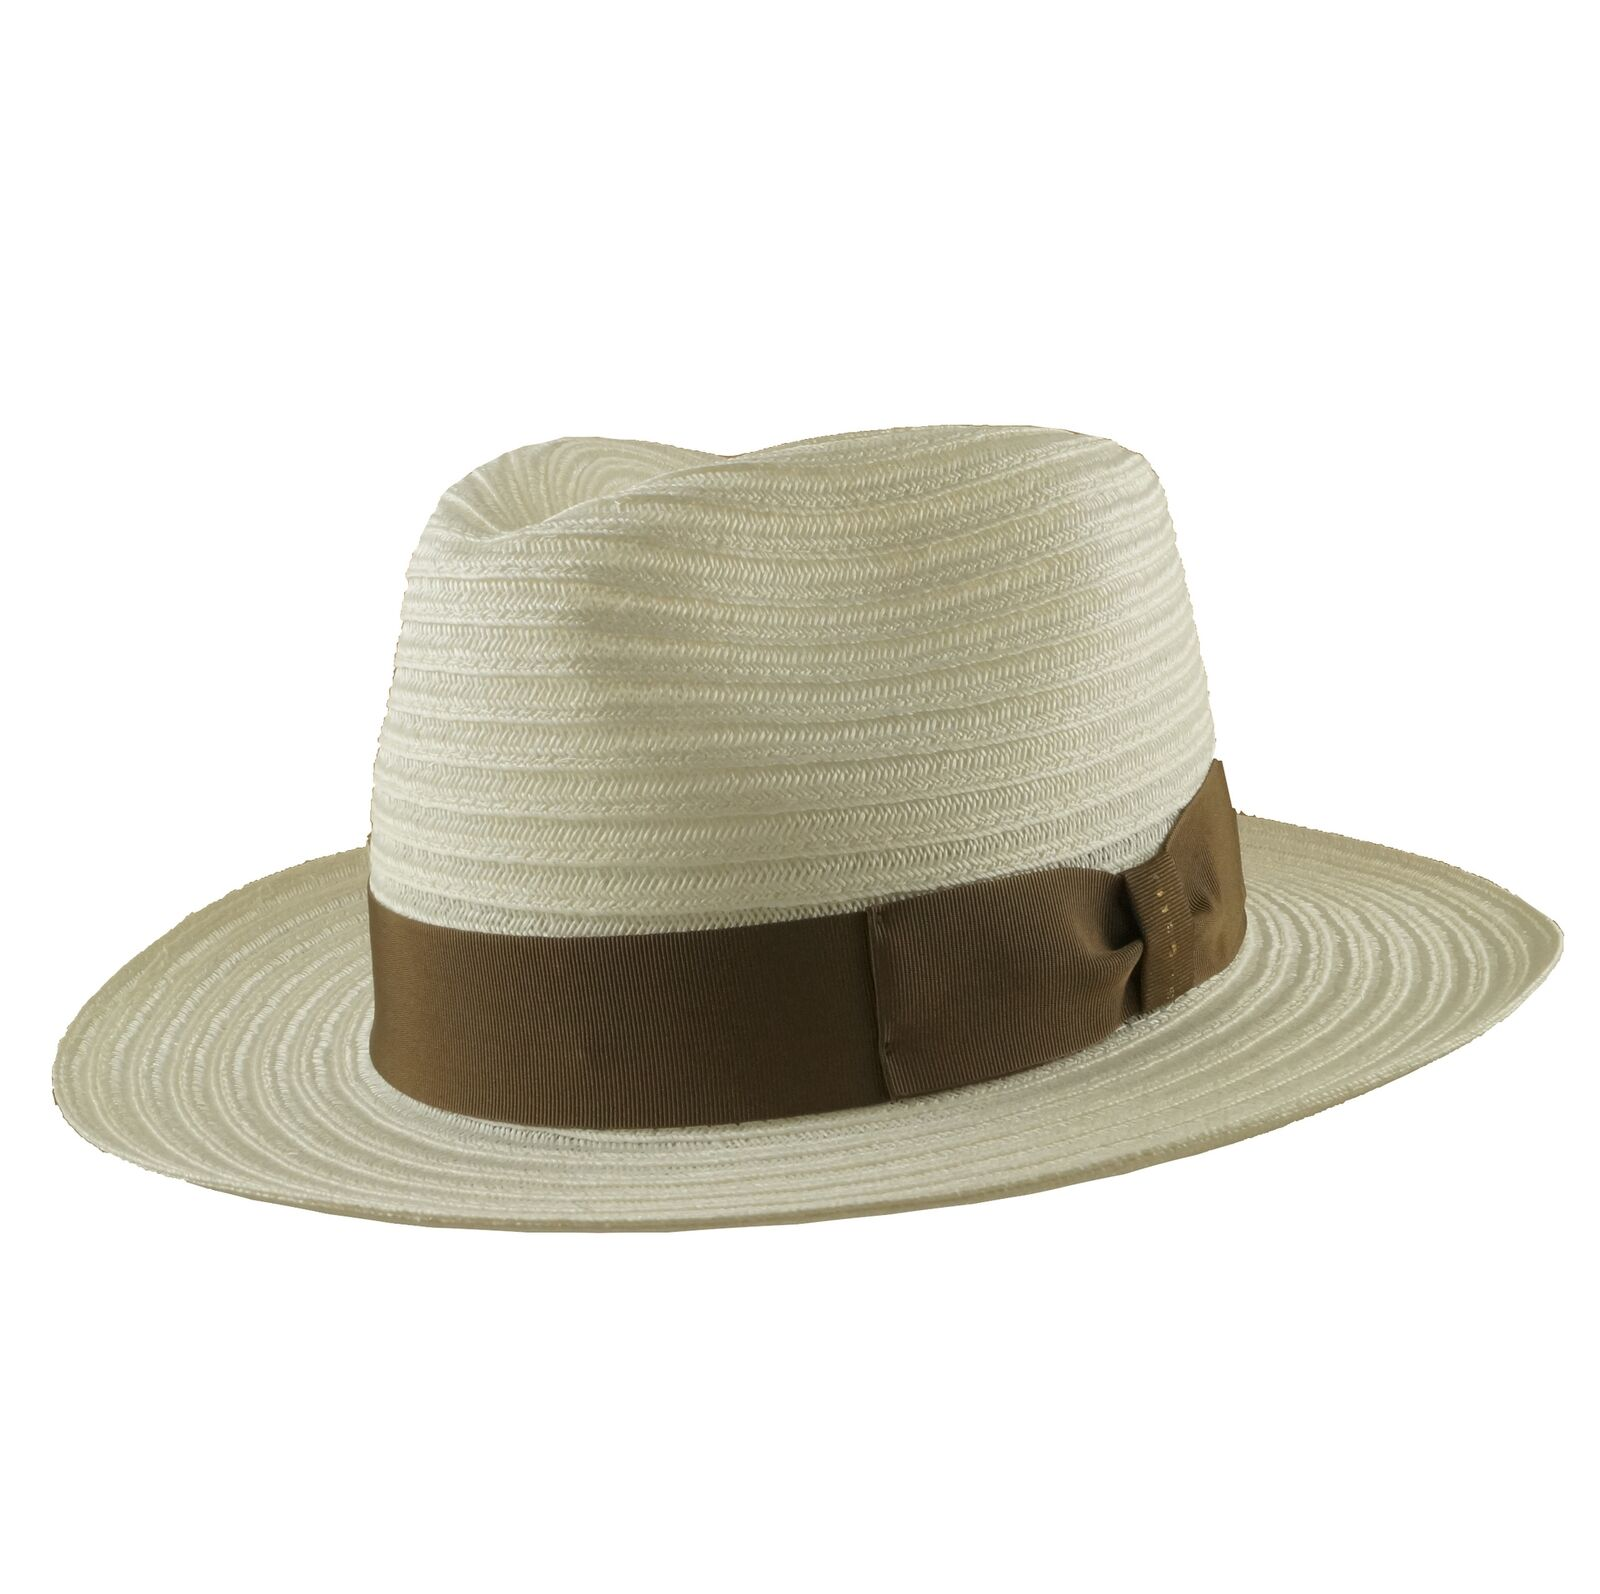 Bugatti Mens strohhhut-Summer Hat Sun Hat gartenhut Hat - 100% Hemp Natural